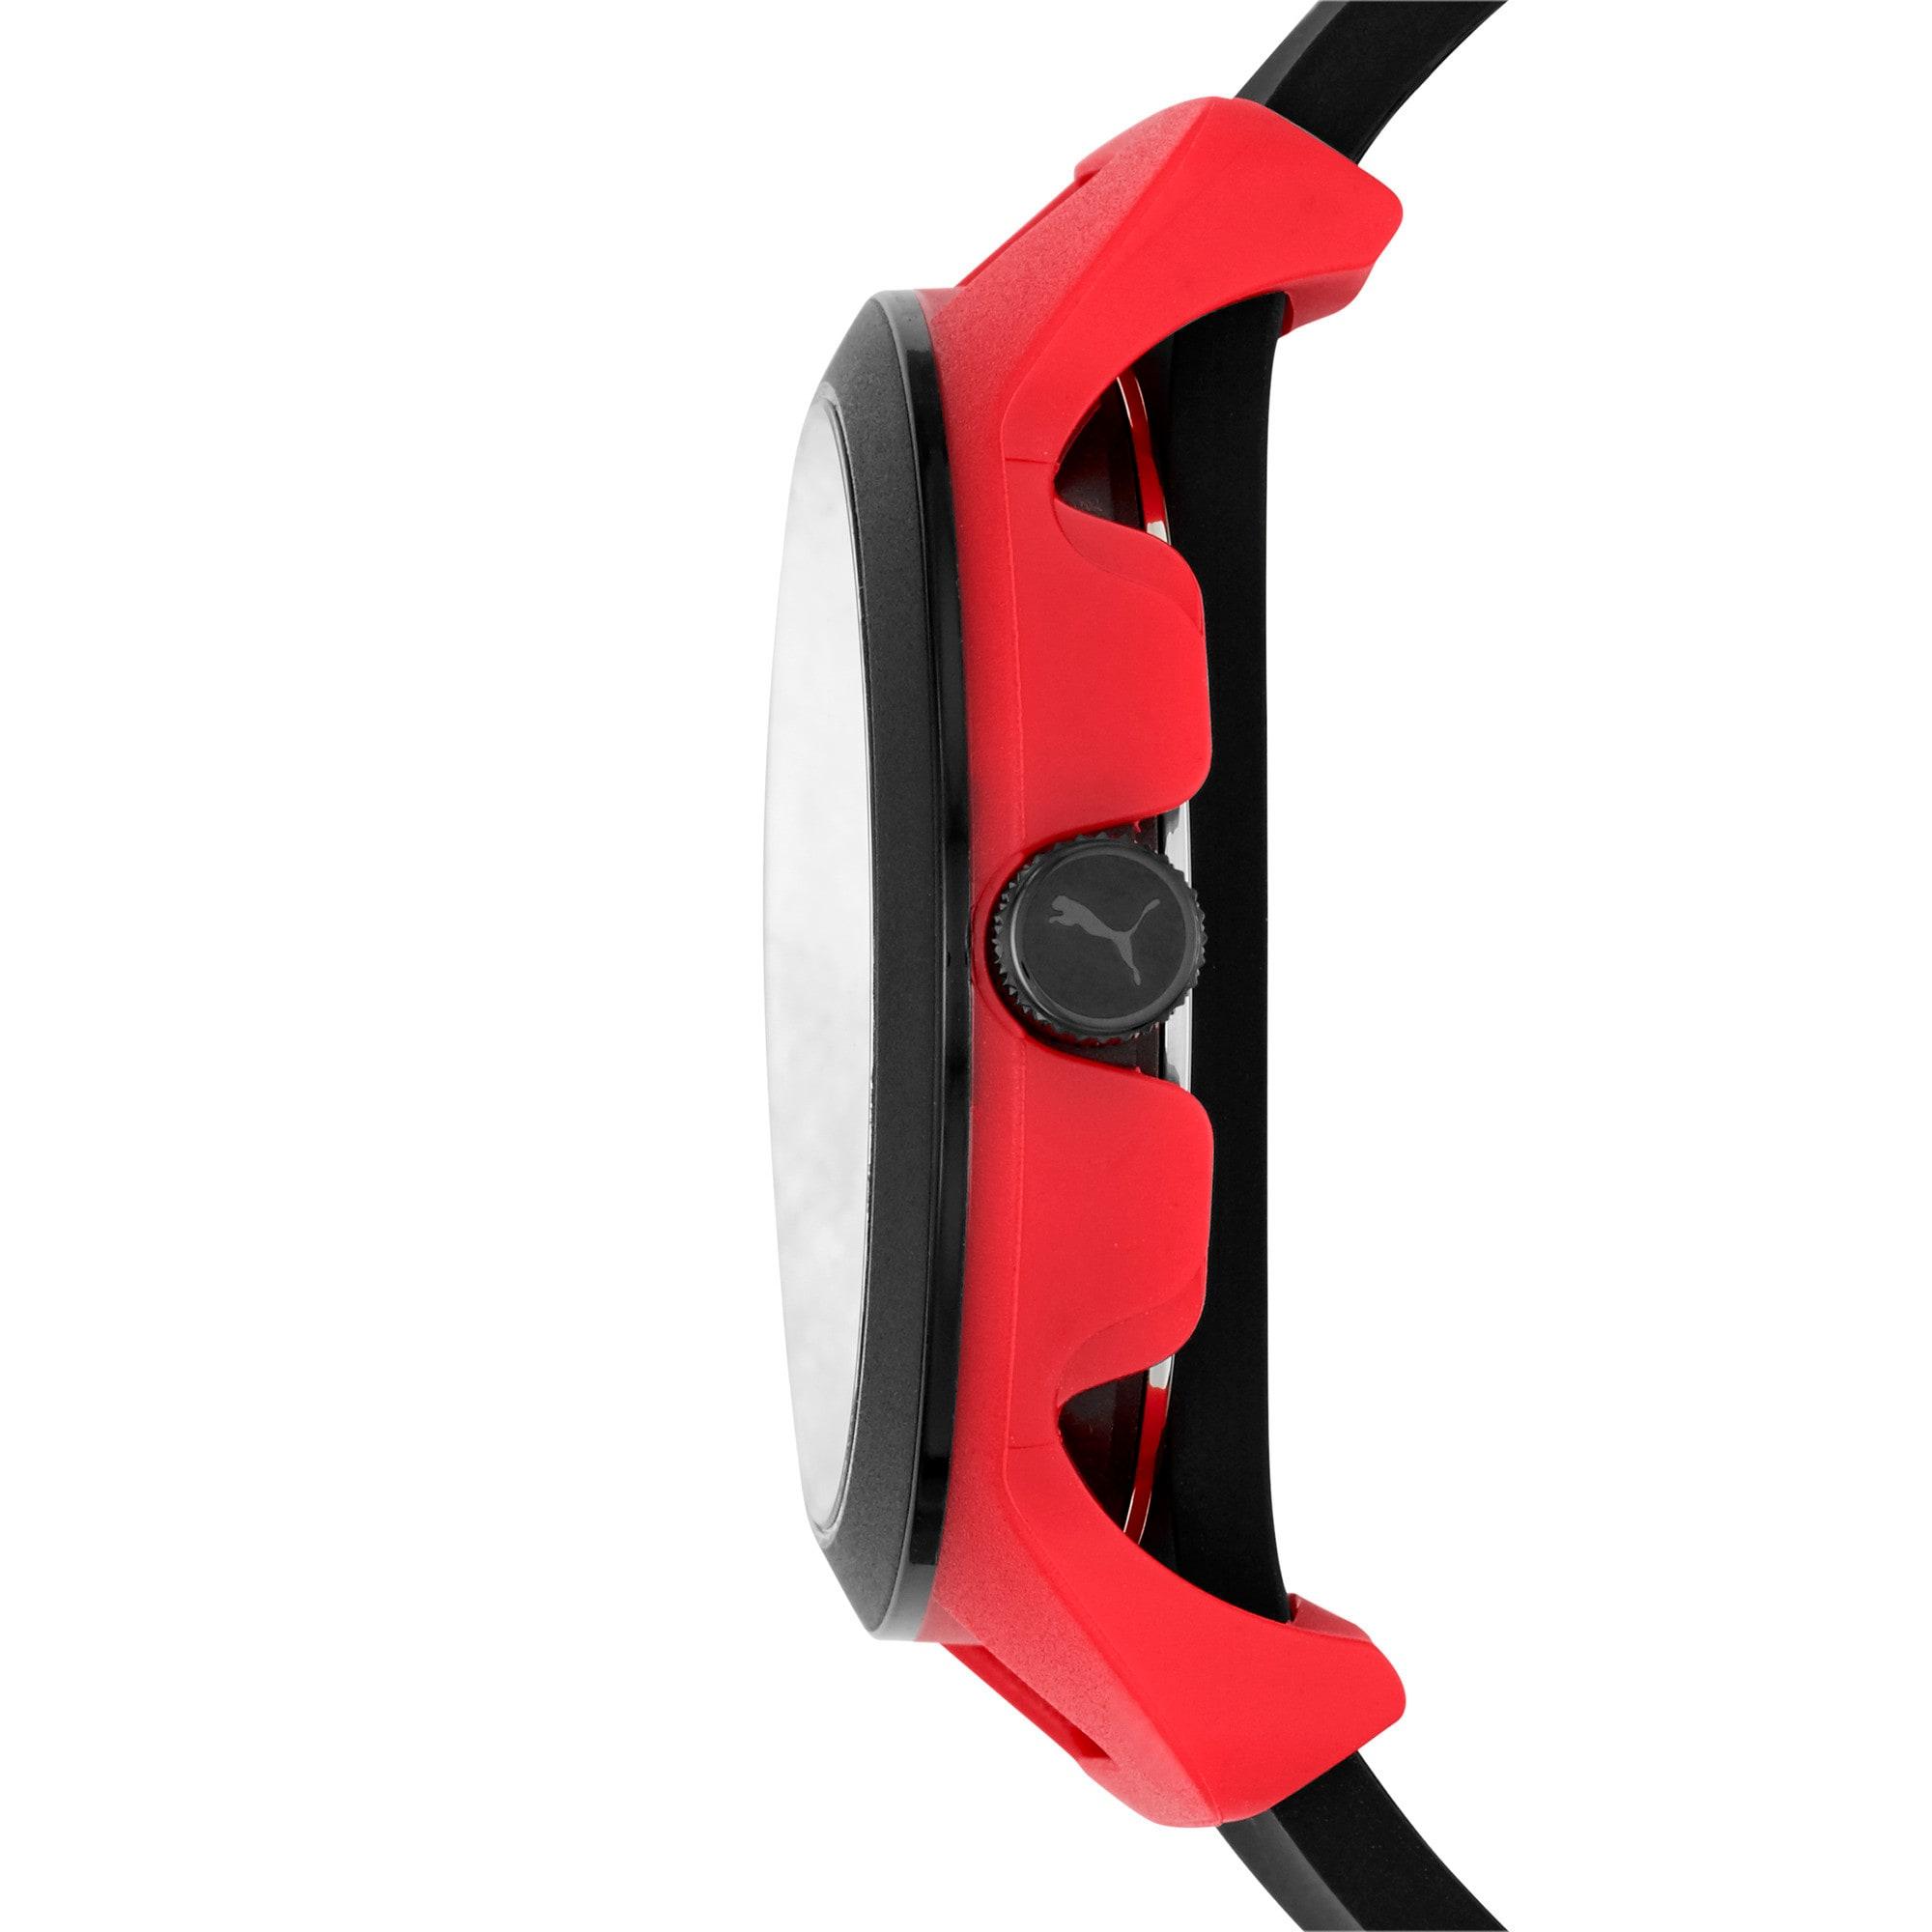 Thumbnail 3 of メンズ リセット シリコン V1  時計, Red/Black, medium-JPN